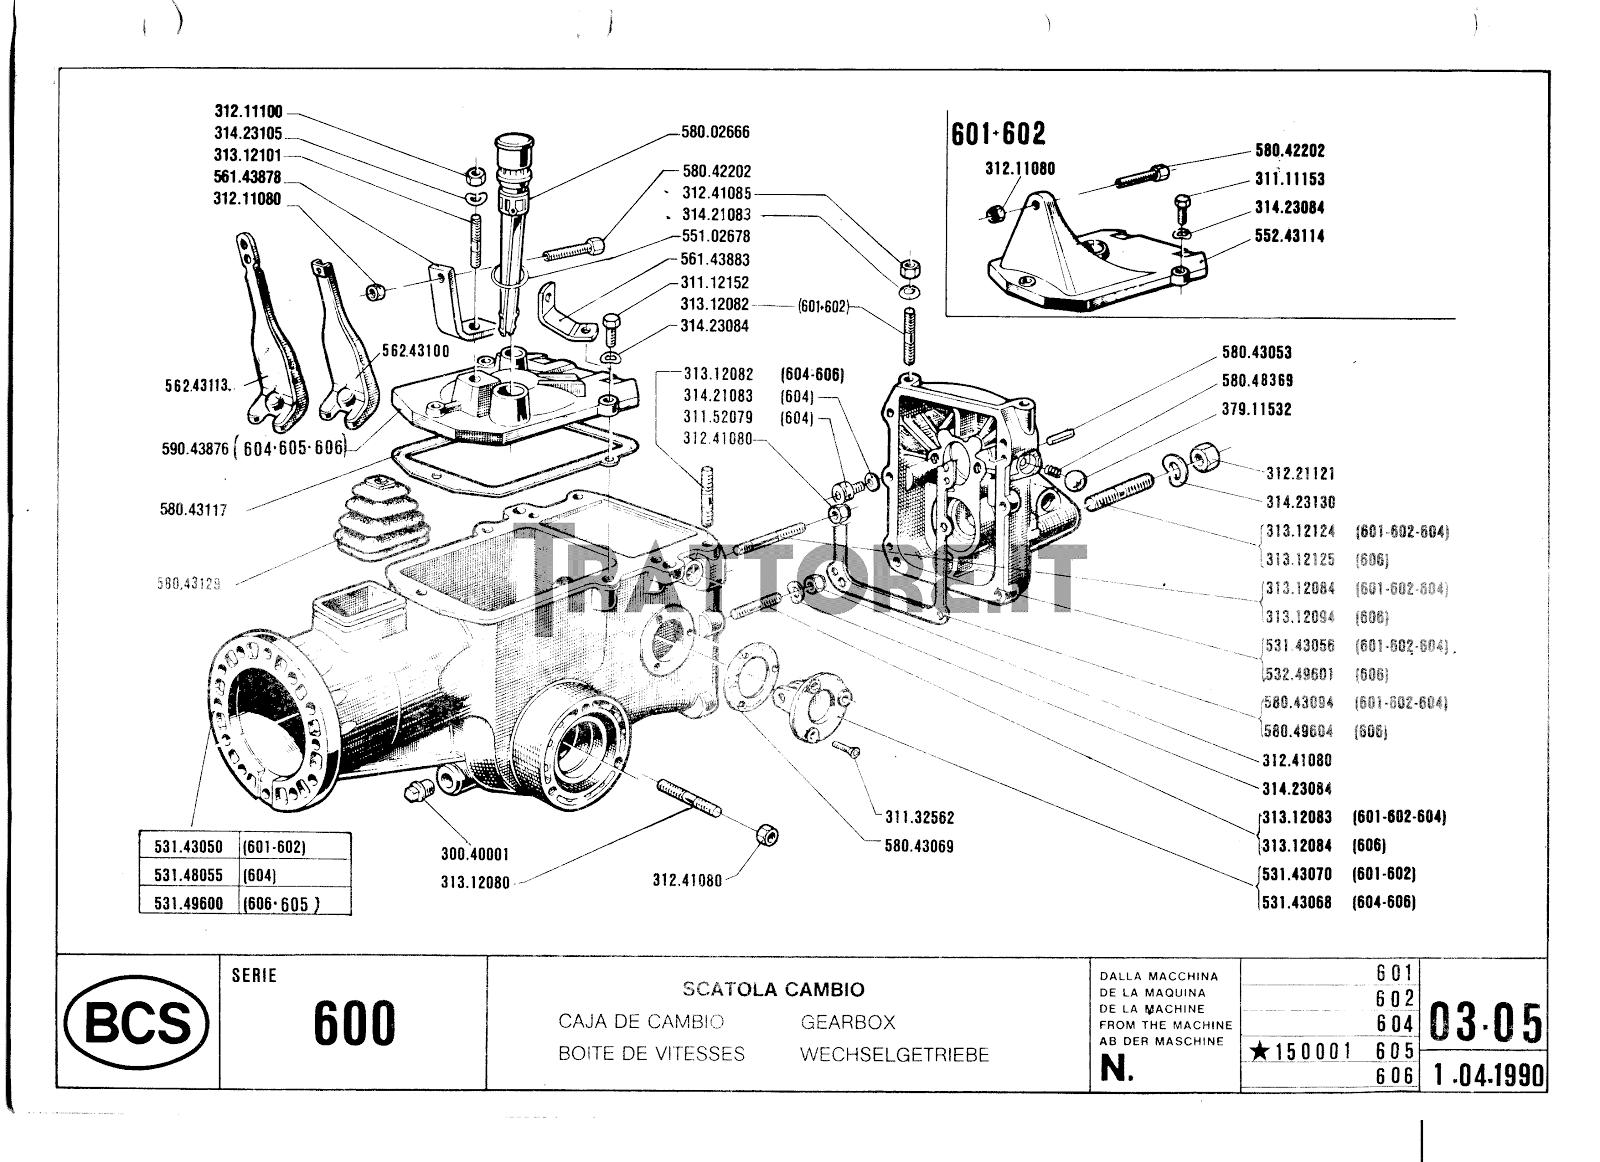 Motofalciatrice bcs 602